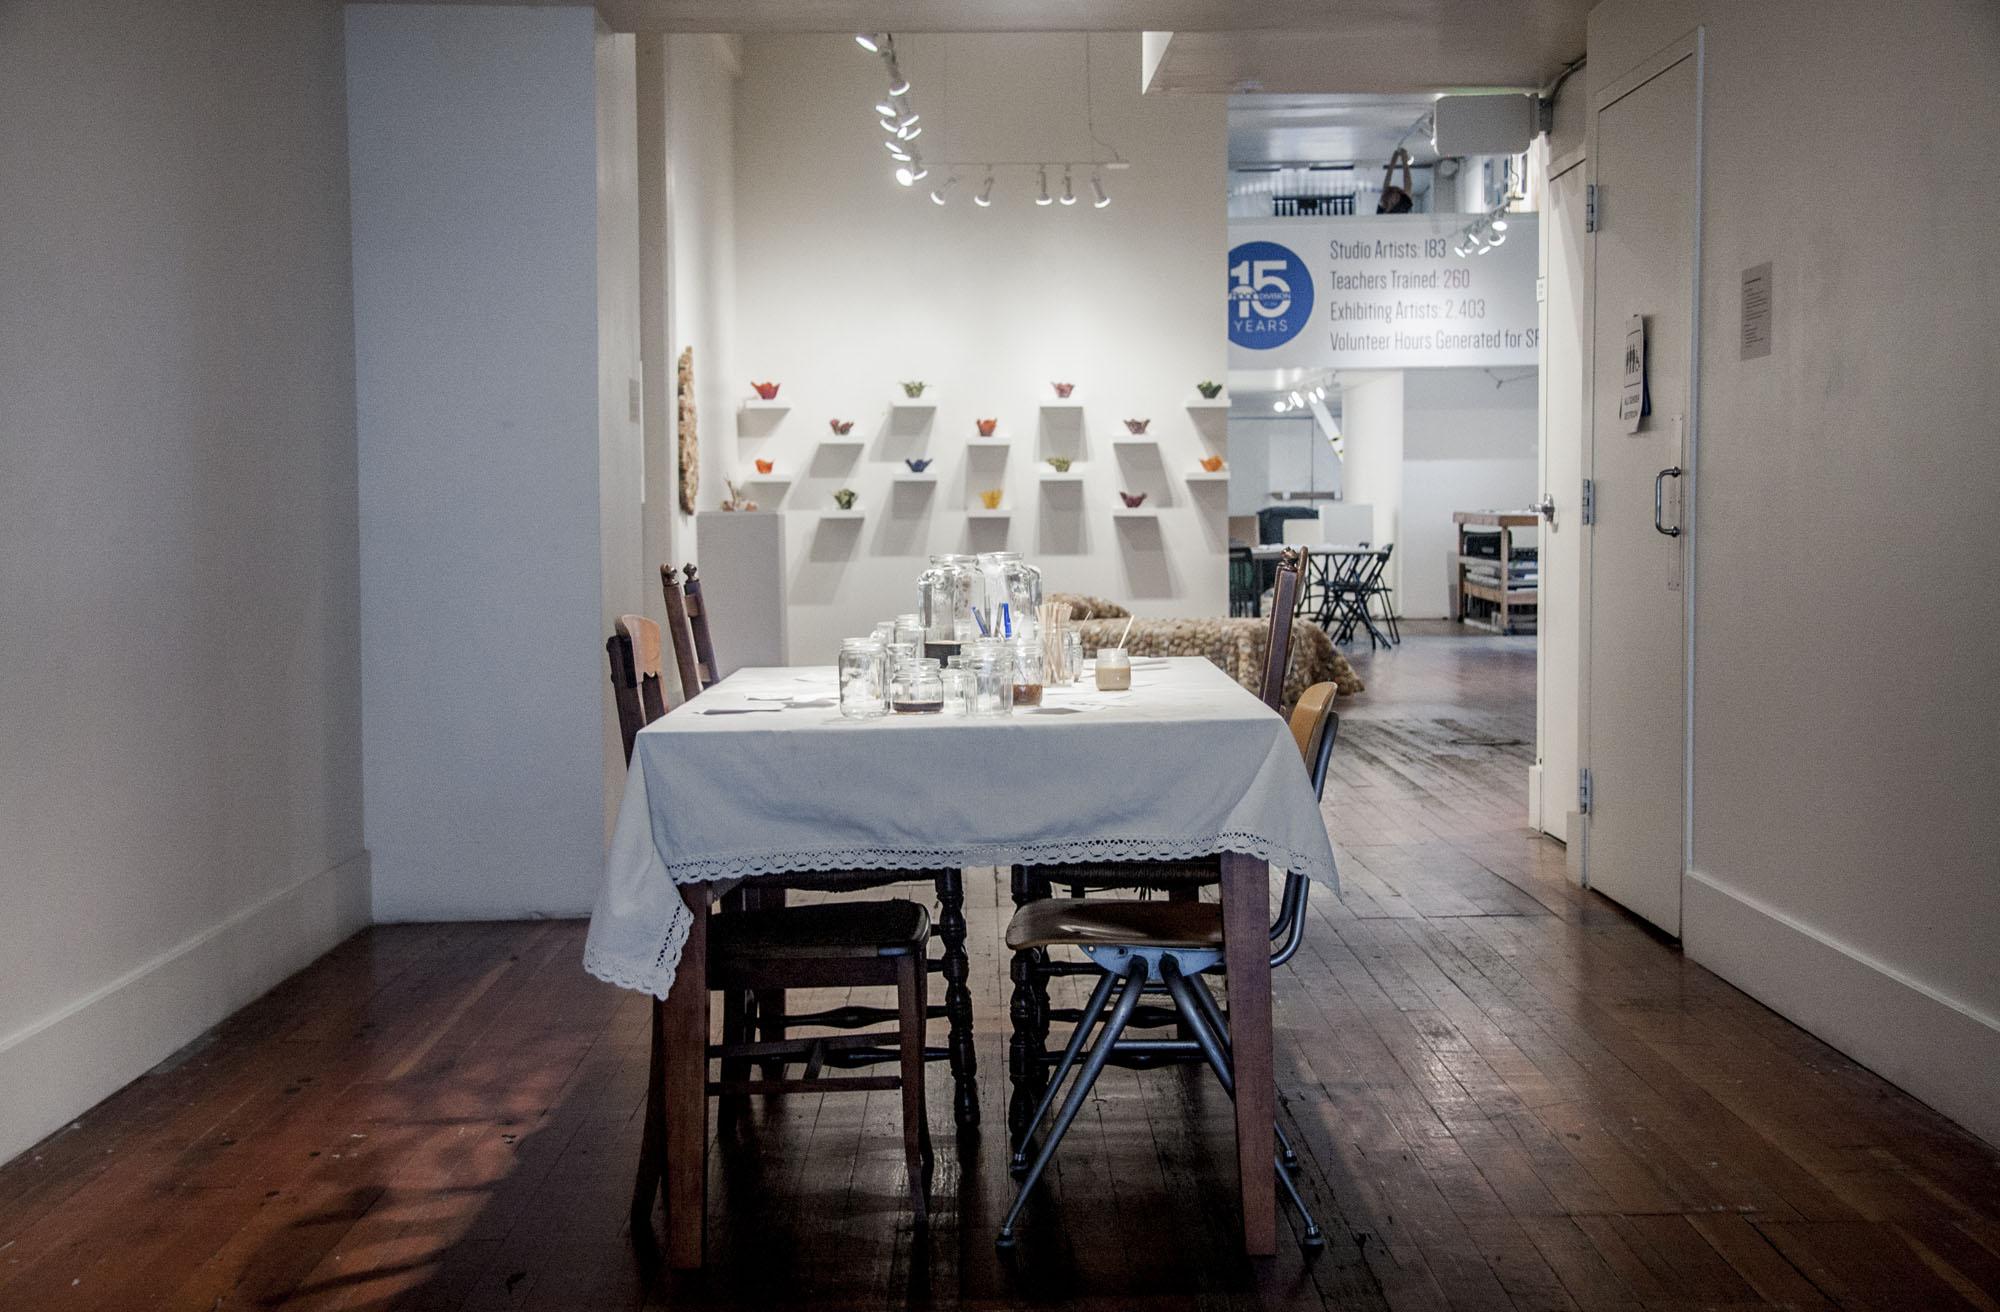 Café con Leche Conversation Residues, installation view